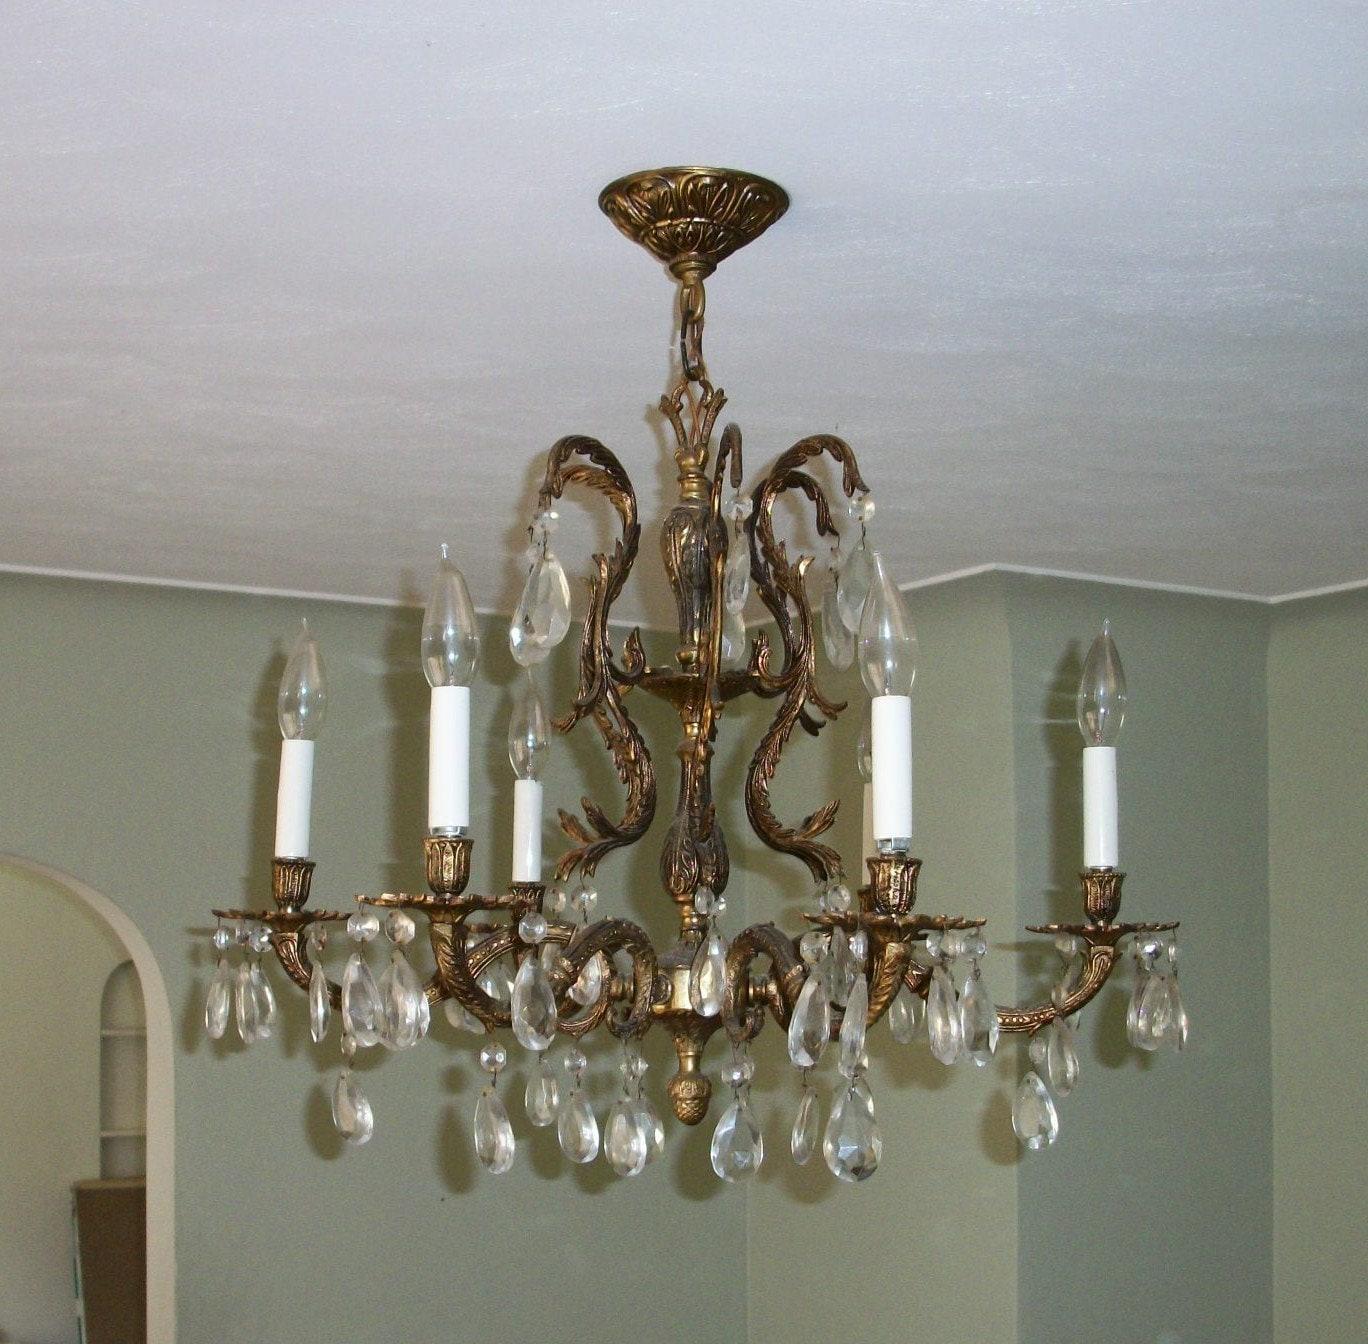 Vintage Brass Candelabra Chandelier Six light Pendant Ceiling